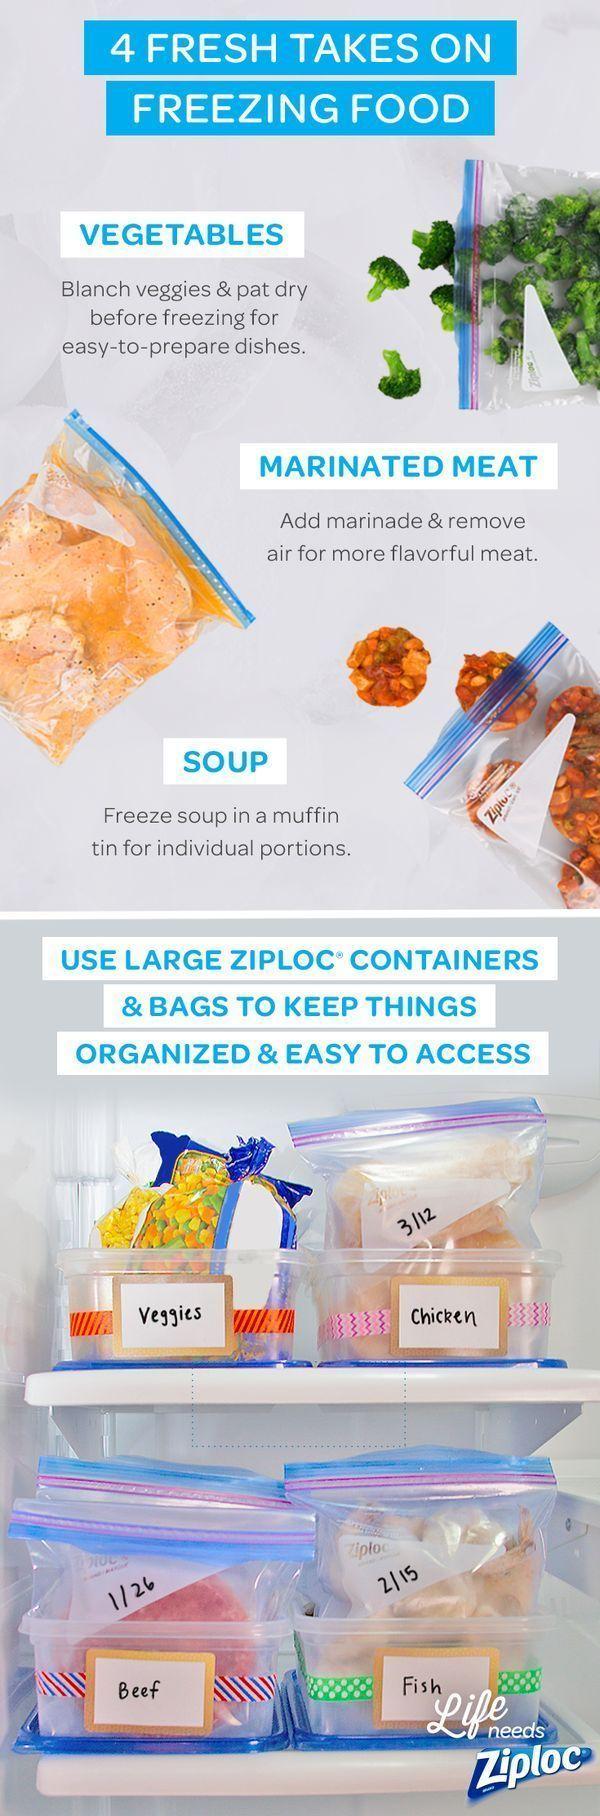 74 Best Health Images On Pinterest Home Remedies Natural Medicine Super Top Libido Stl Tips For Freezing Food